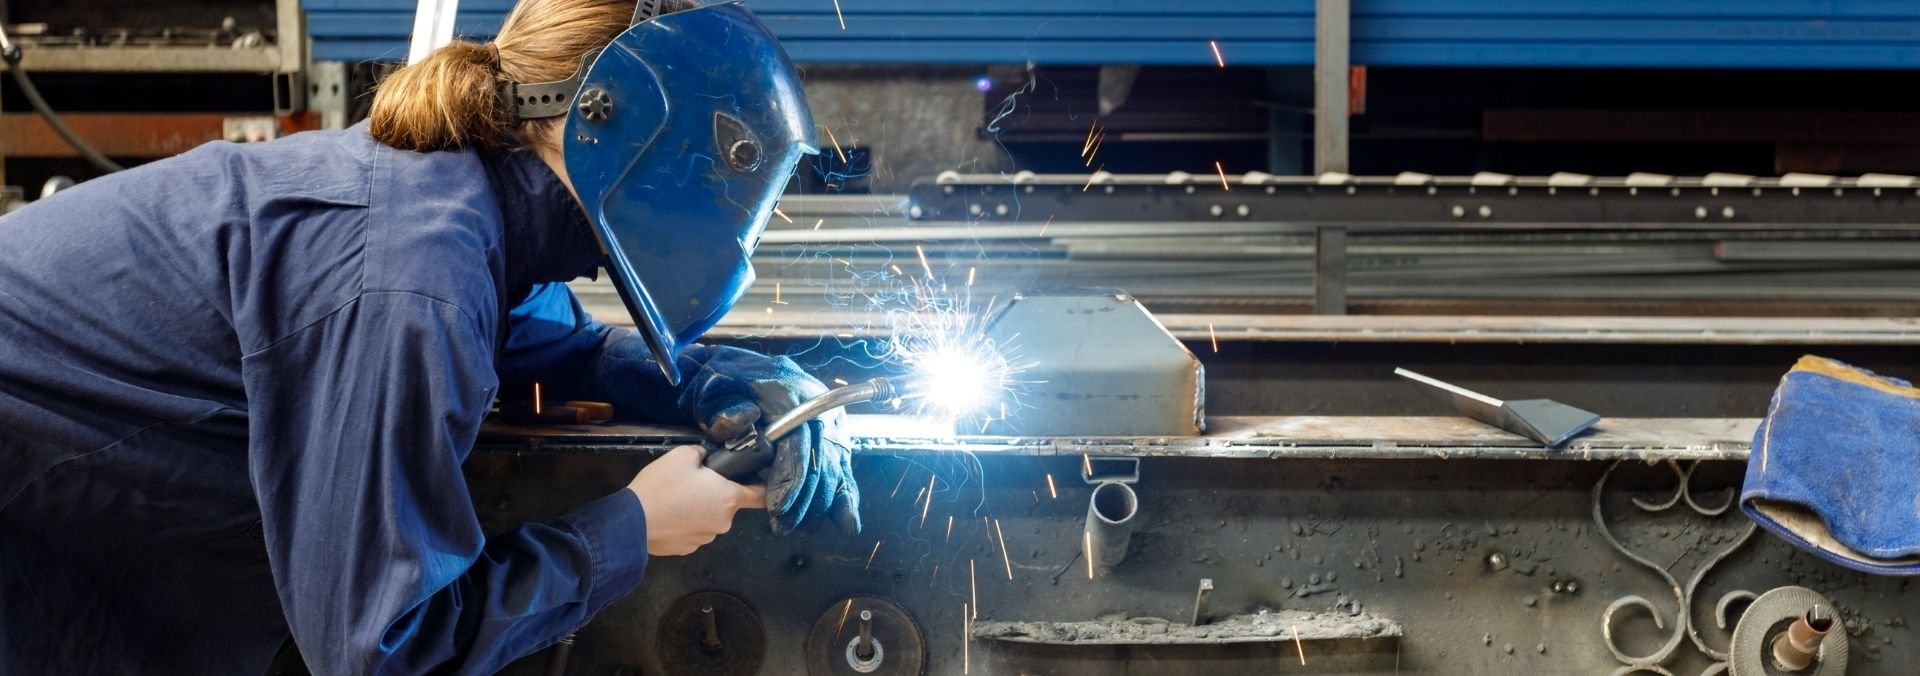 arc welding professional